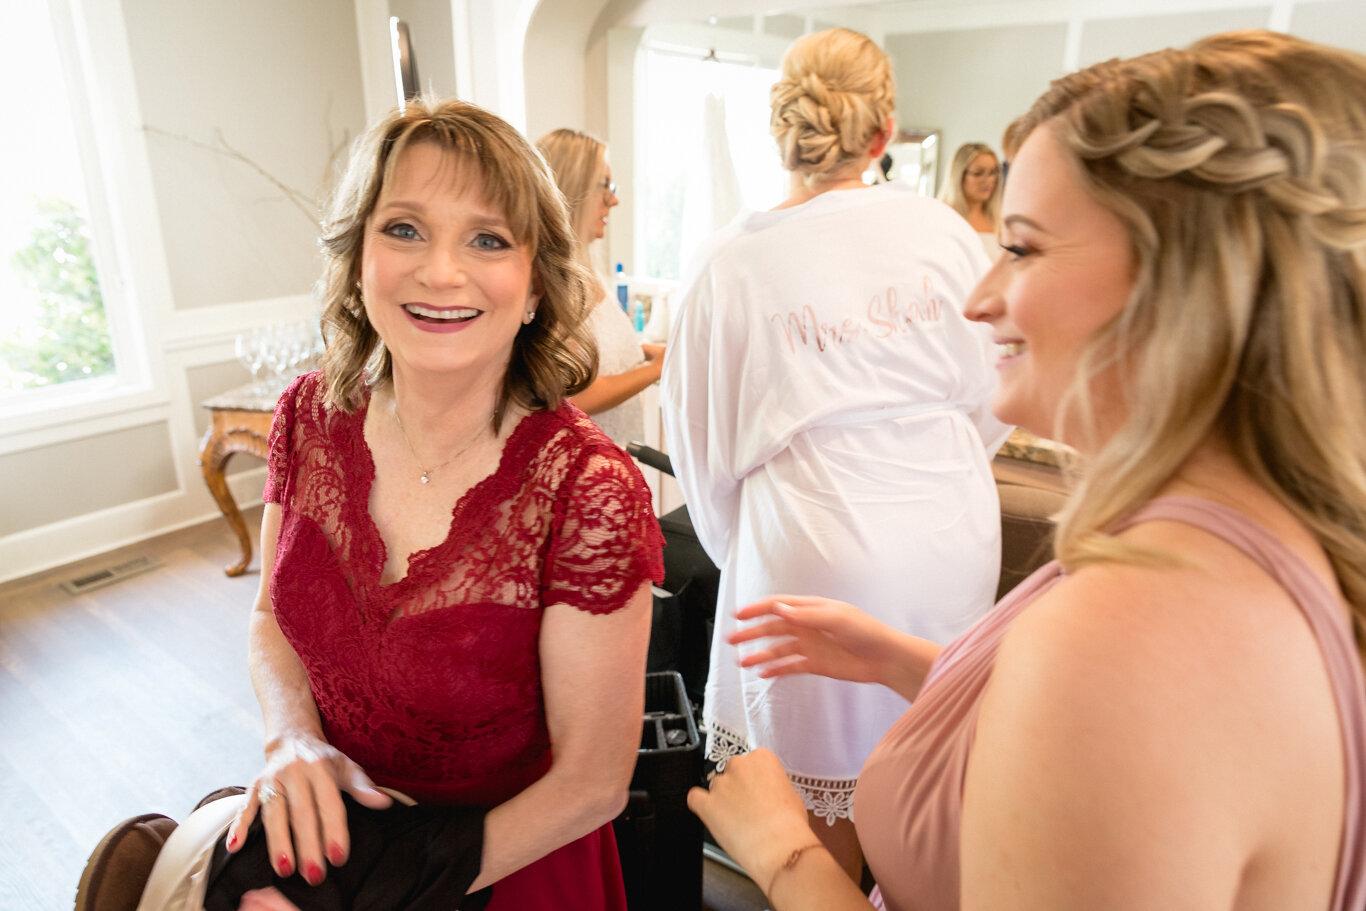 2019.08.24_Emily-Ashir-Wedding-at-the-Maples-4888.jpg